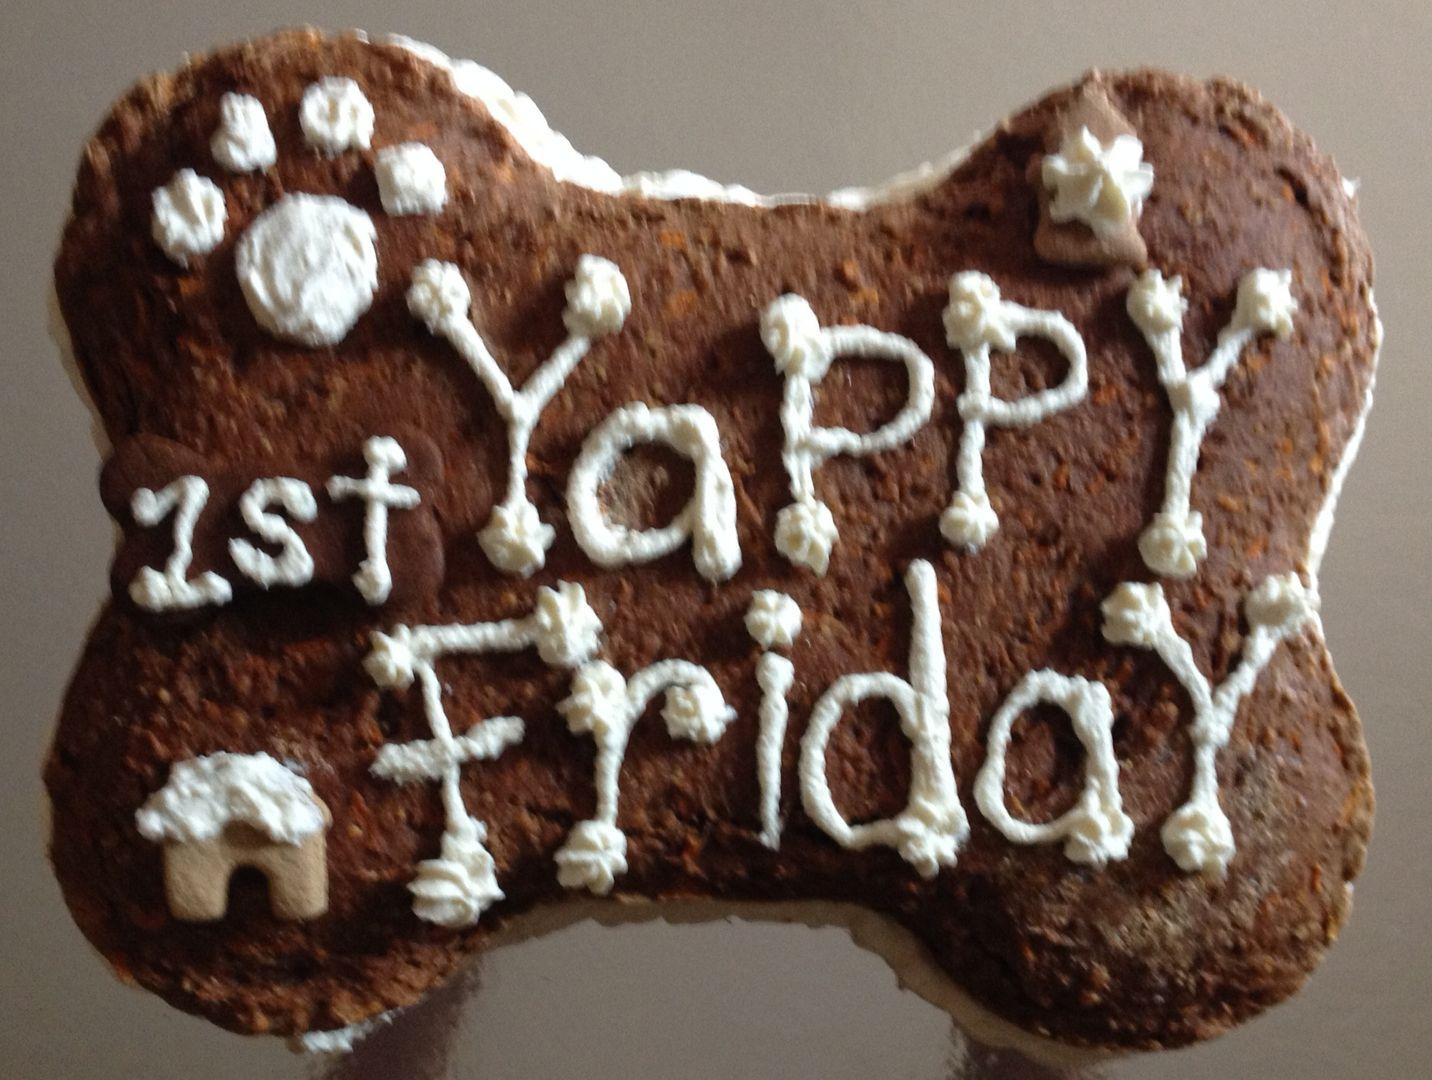 Adorable dog birthday cake from Biscotti Hound in Denver www